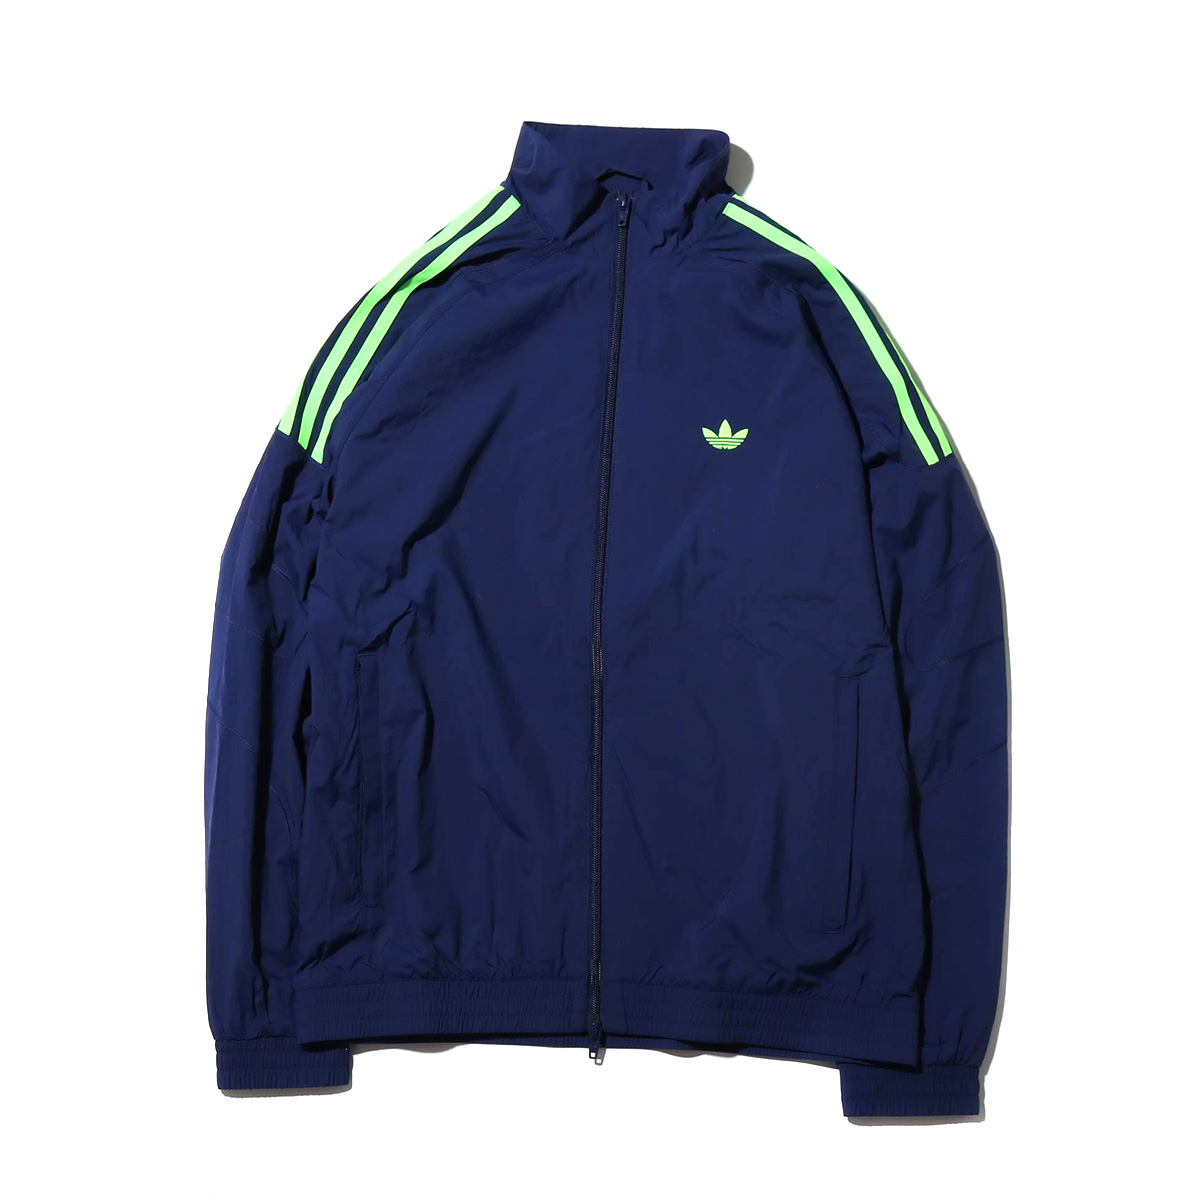 adidas Originals FLAMESTRIKE WOVEN TRACK TOP(DARK BLUE)(アディダスオリジナルス フレームストライク ウーブン トラックトップ)【メンズ】【ジャケット】【18FW-I】